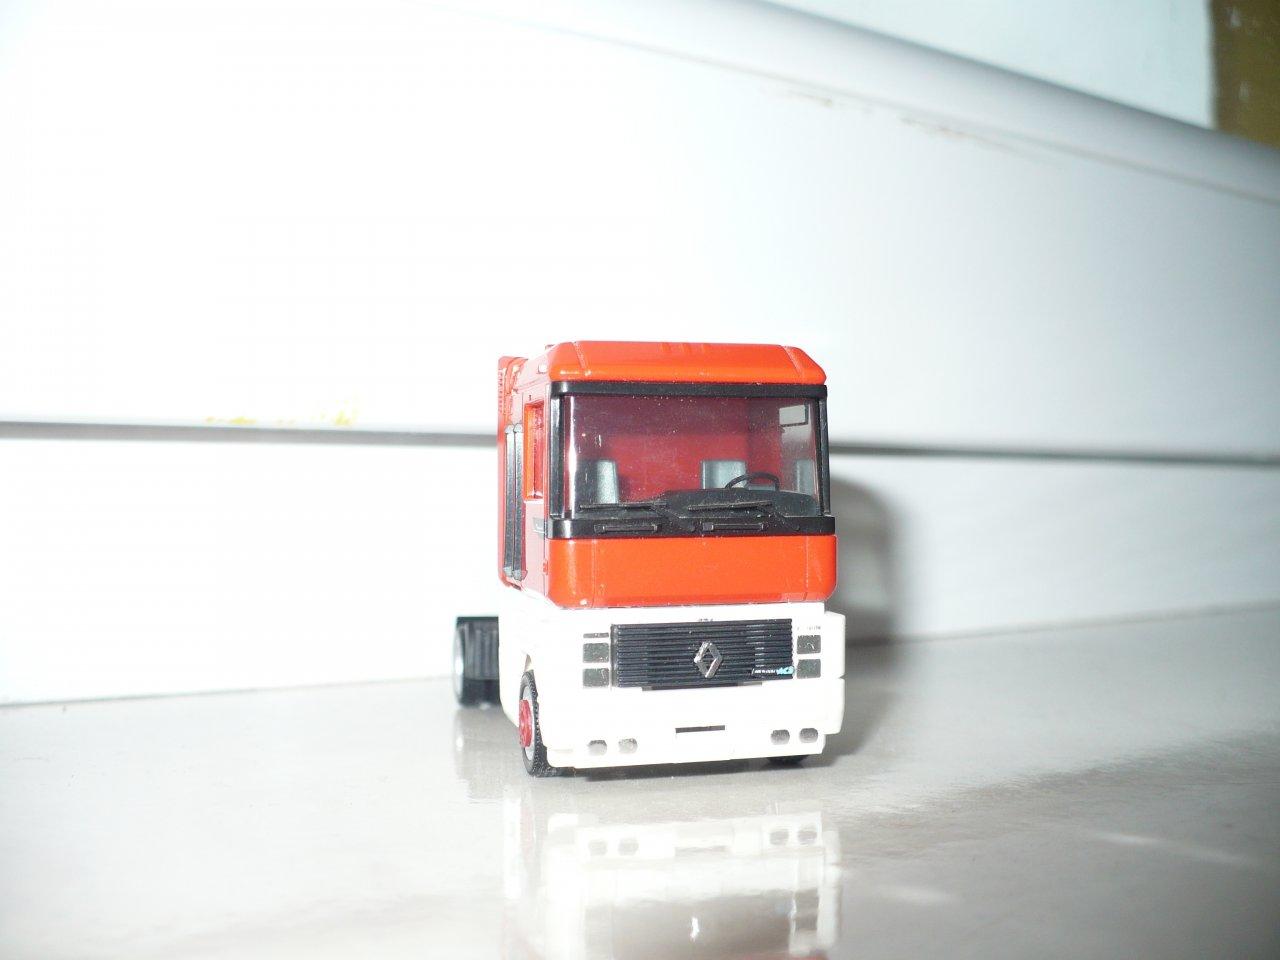 P1010333.JPG